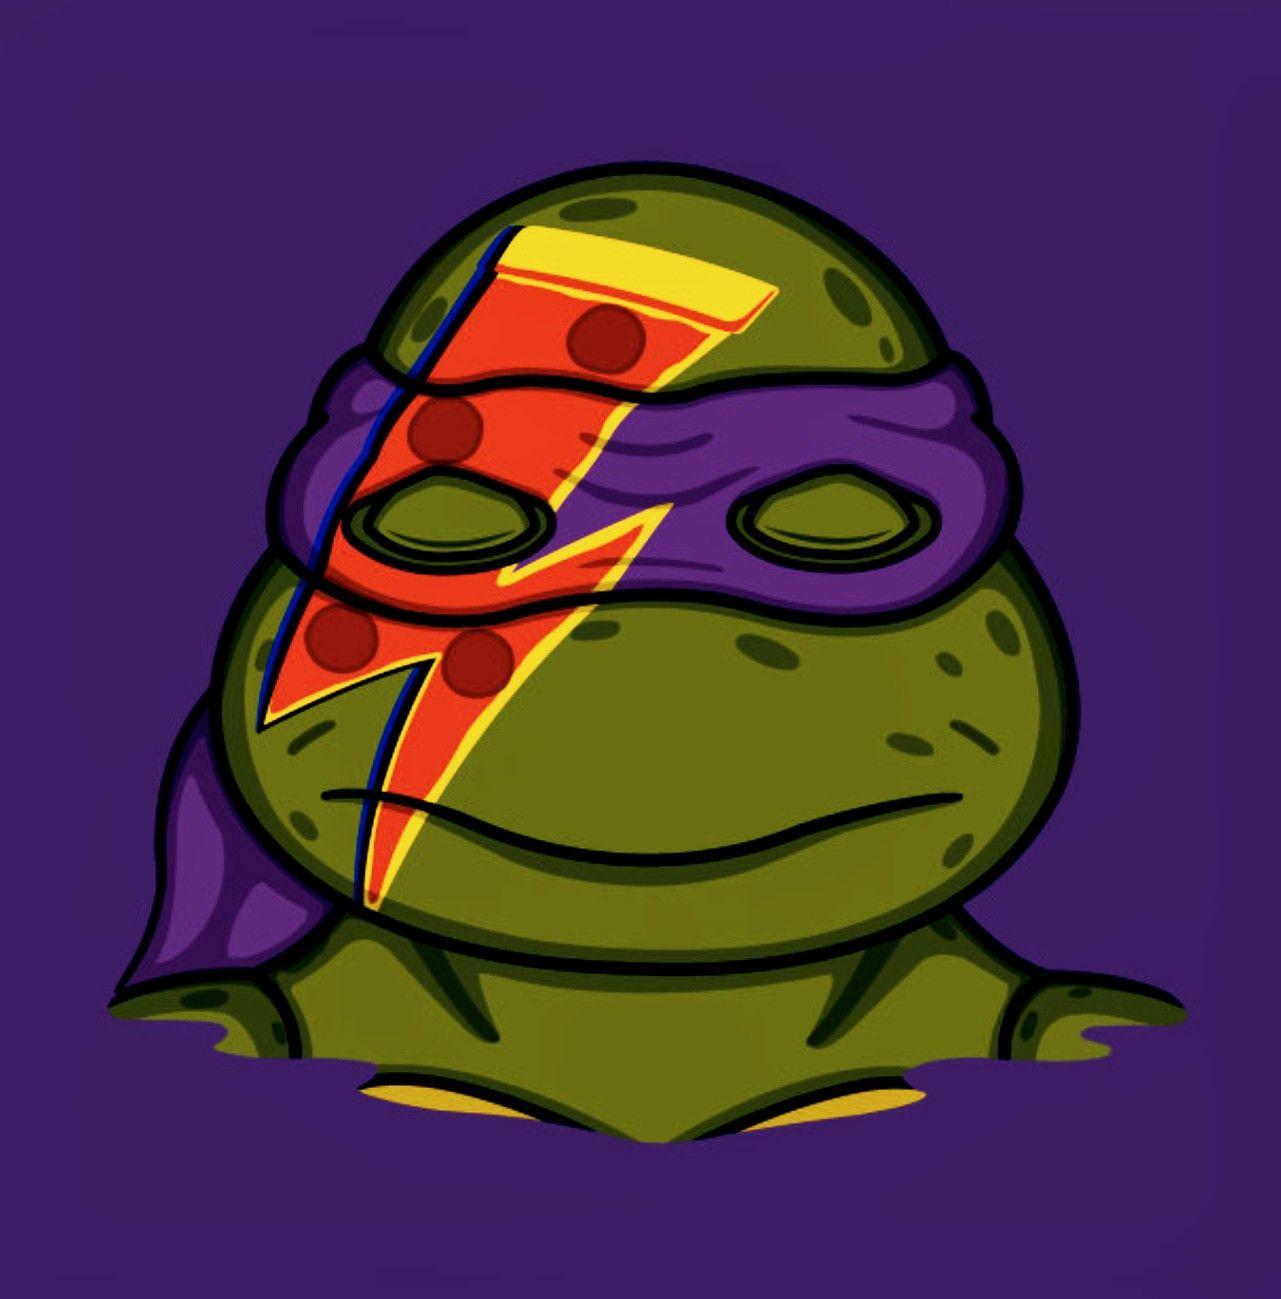 Pin By Teenage Mutant Ninja Turtles On Tmnt Characters Fan Art Tmnt Tmnt Characters Childhood Tv Shows